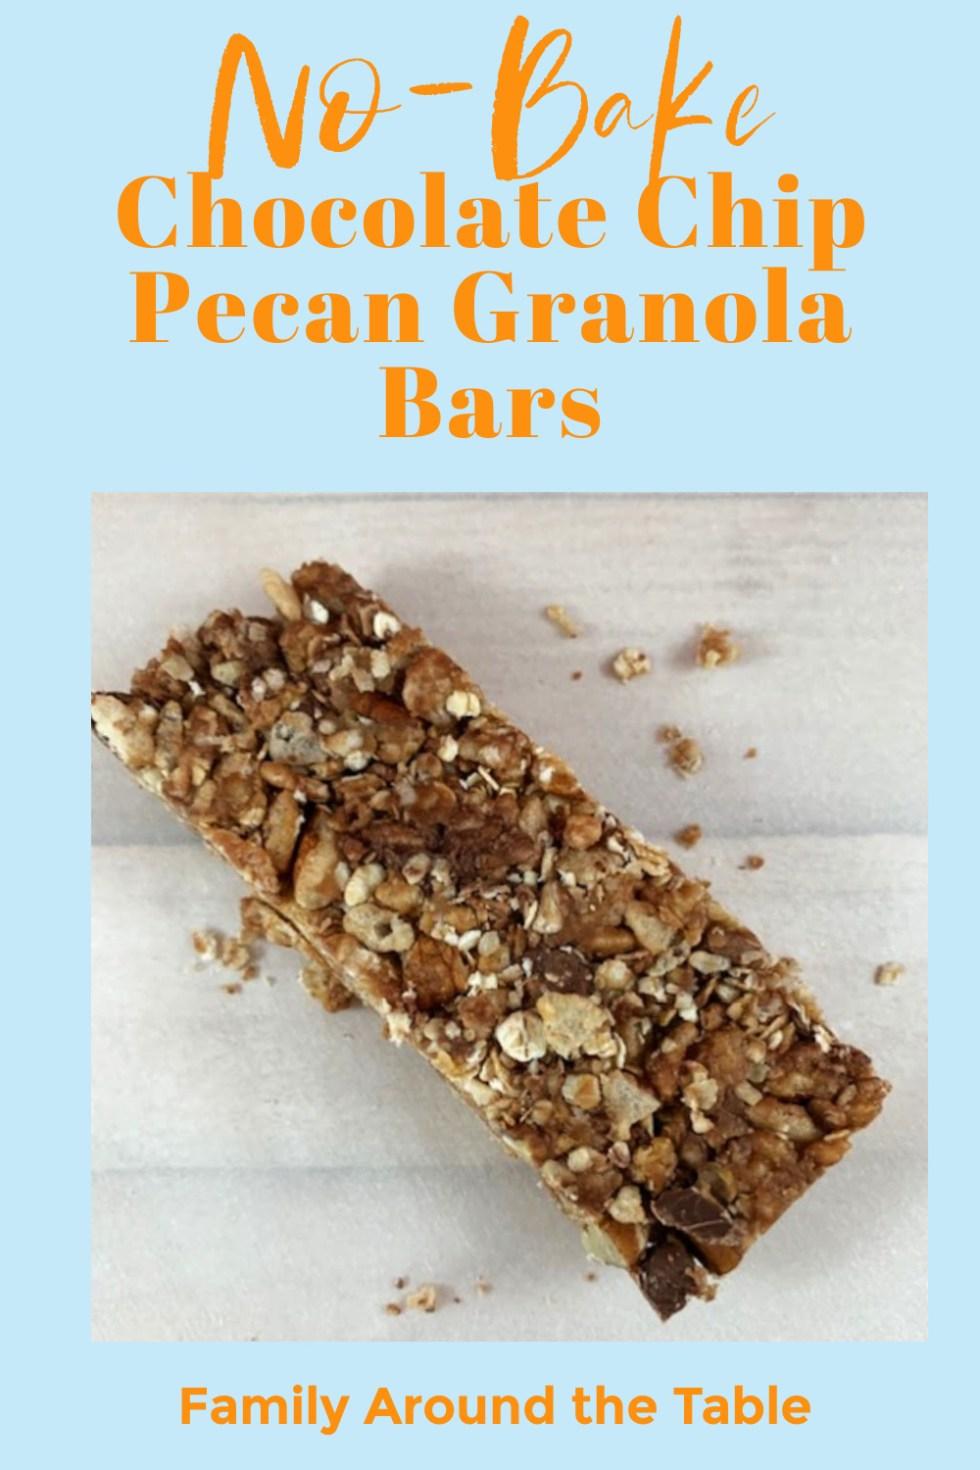 Chocolate Chip Pecan Granola Bars Pinterest Image